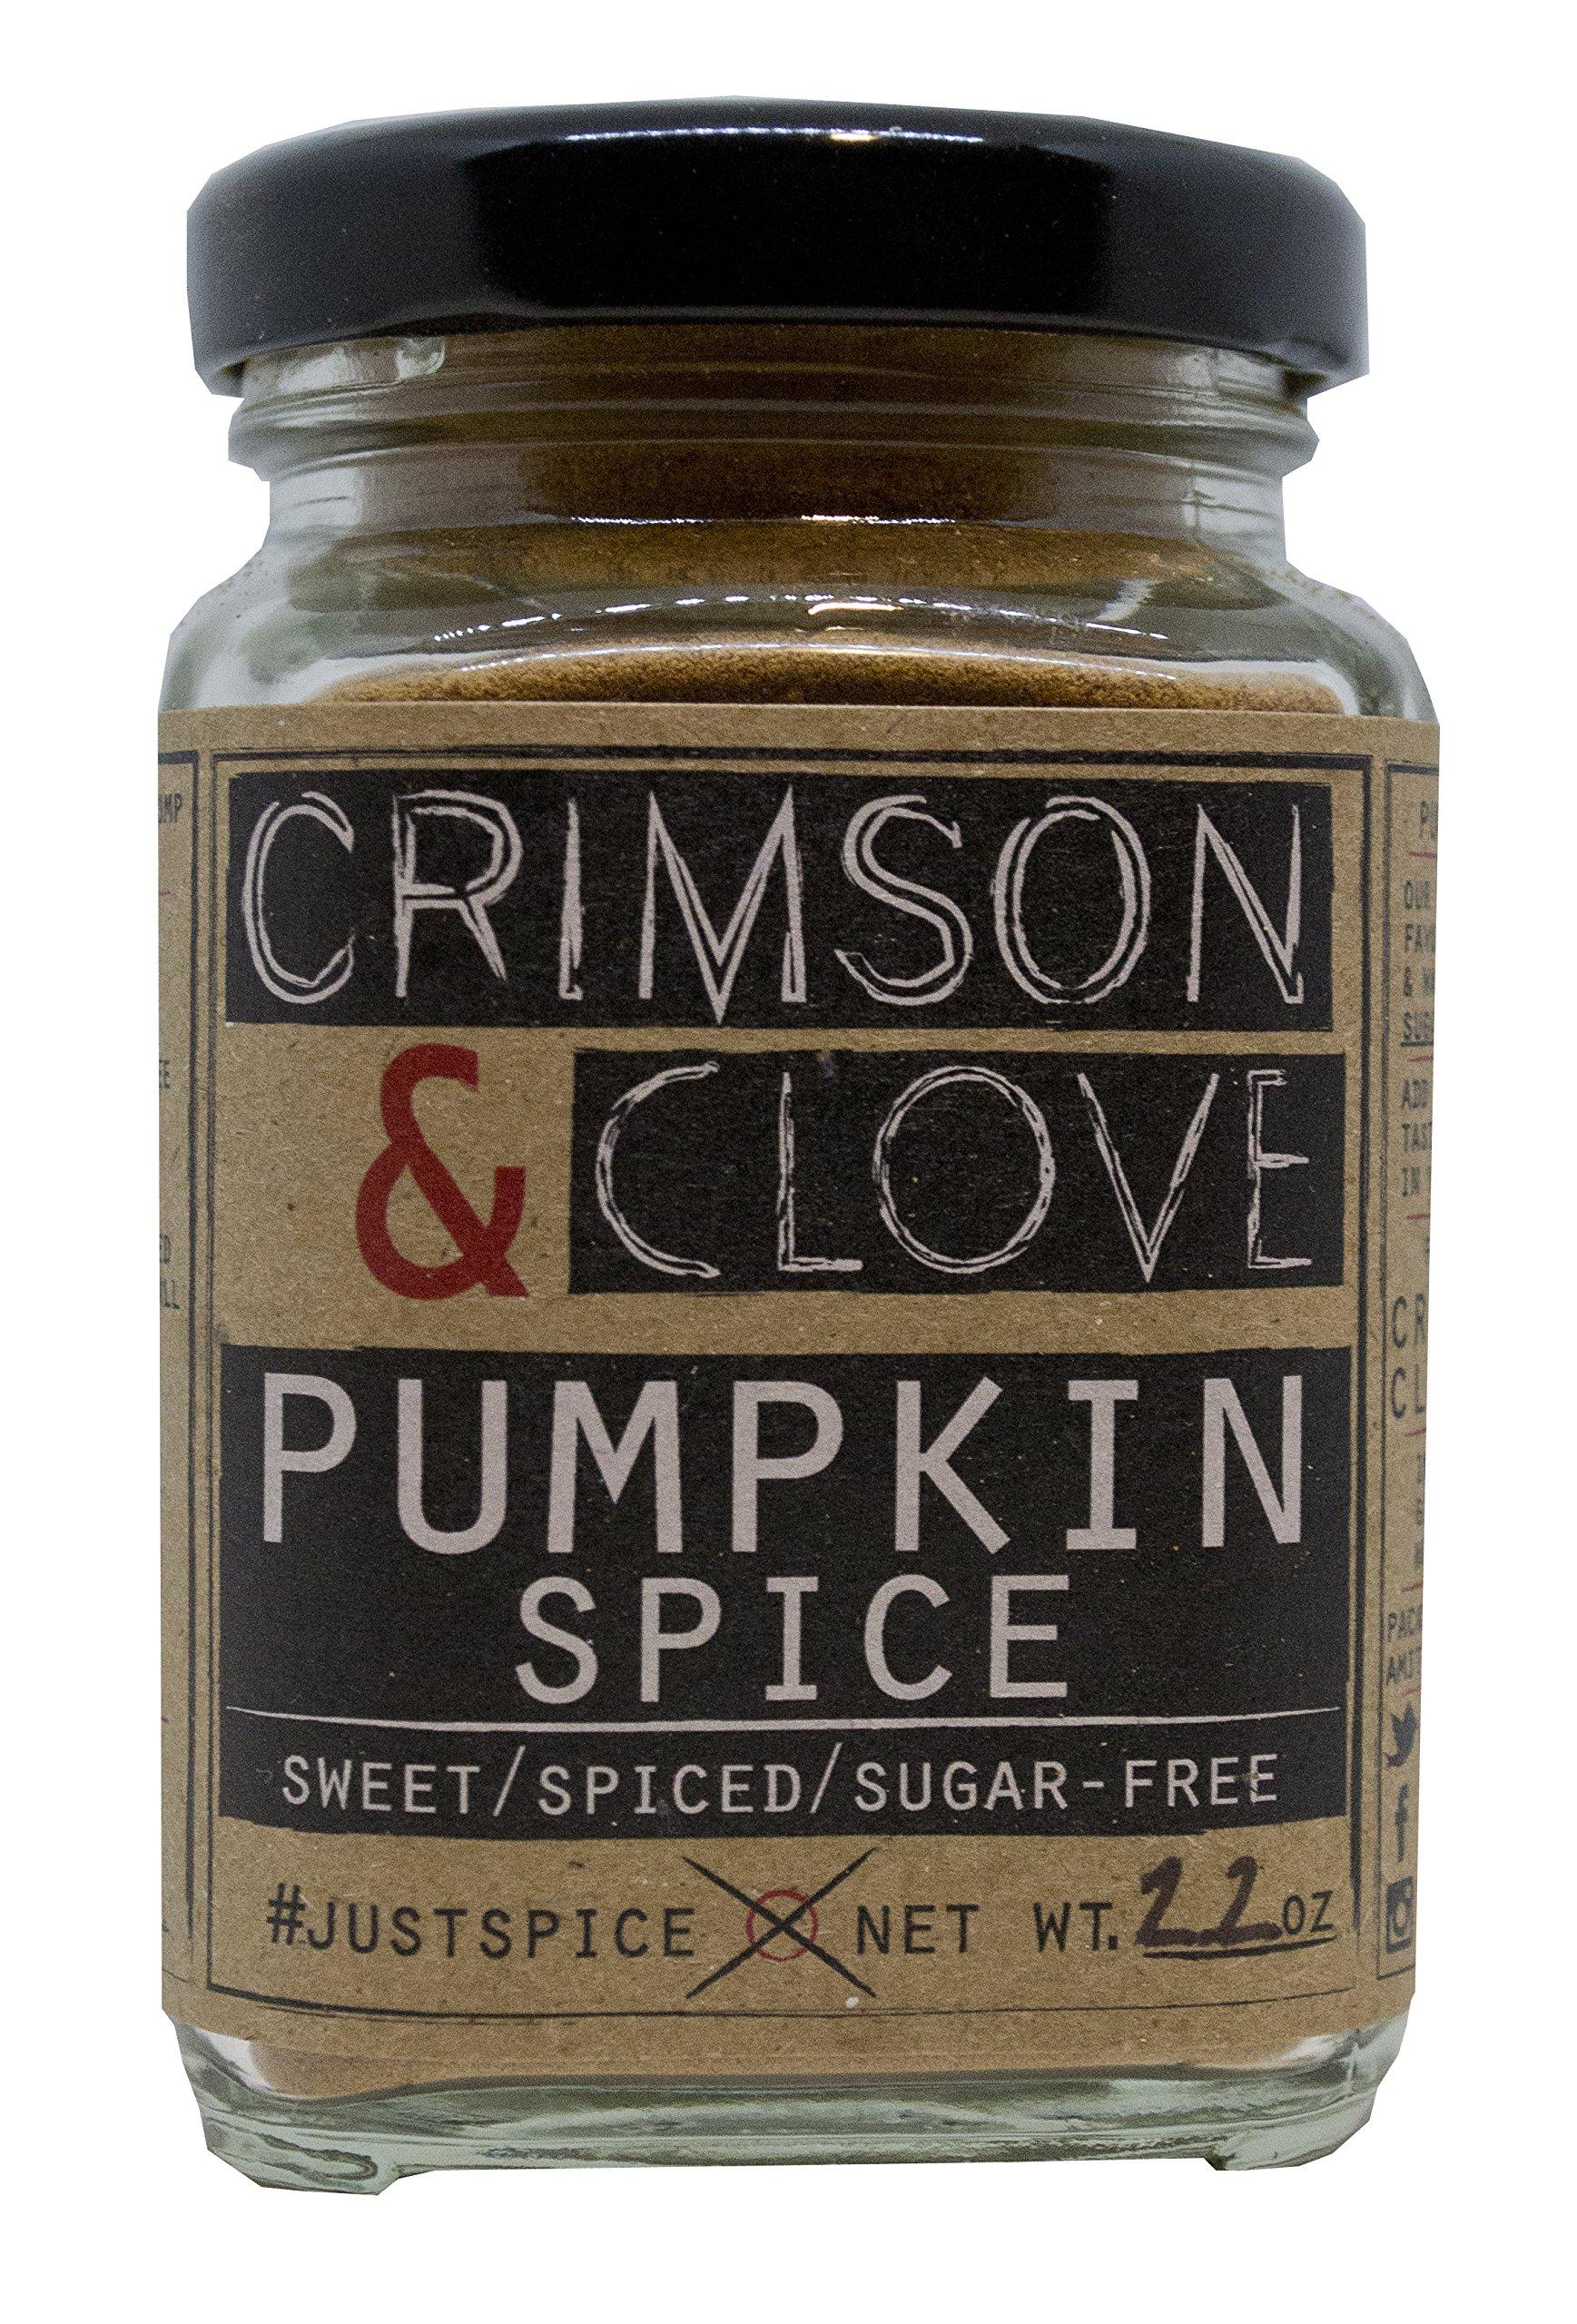 Sugar Free Pumpkin Spice by Crimson and Clove (2.2 oz.)